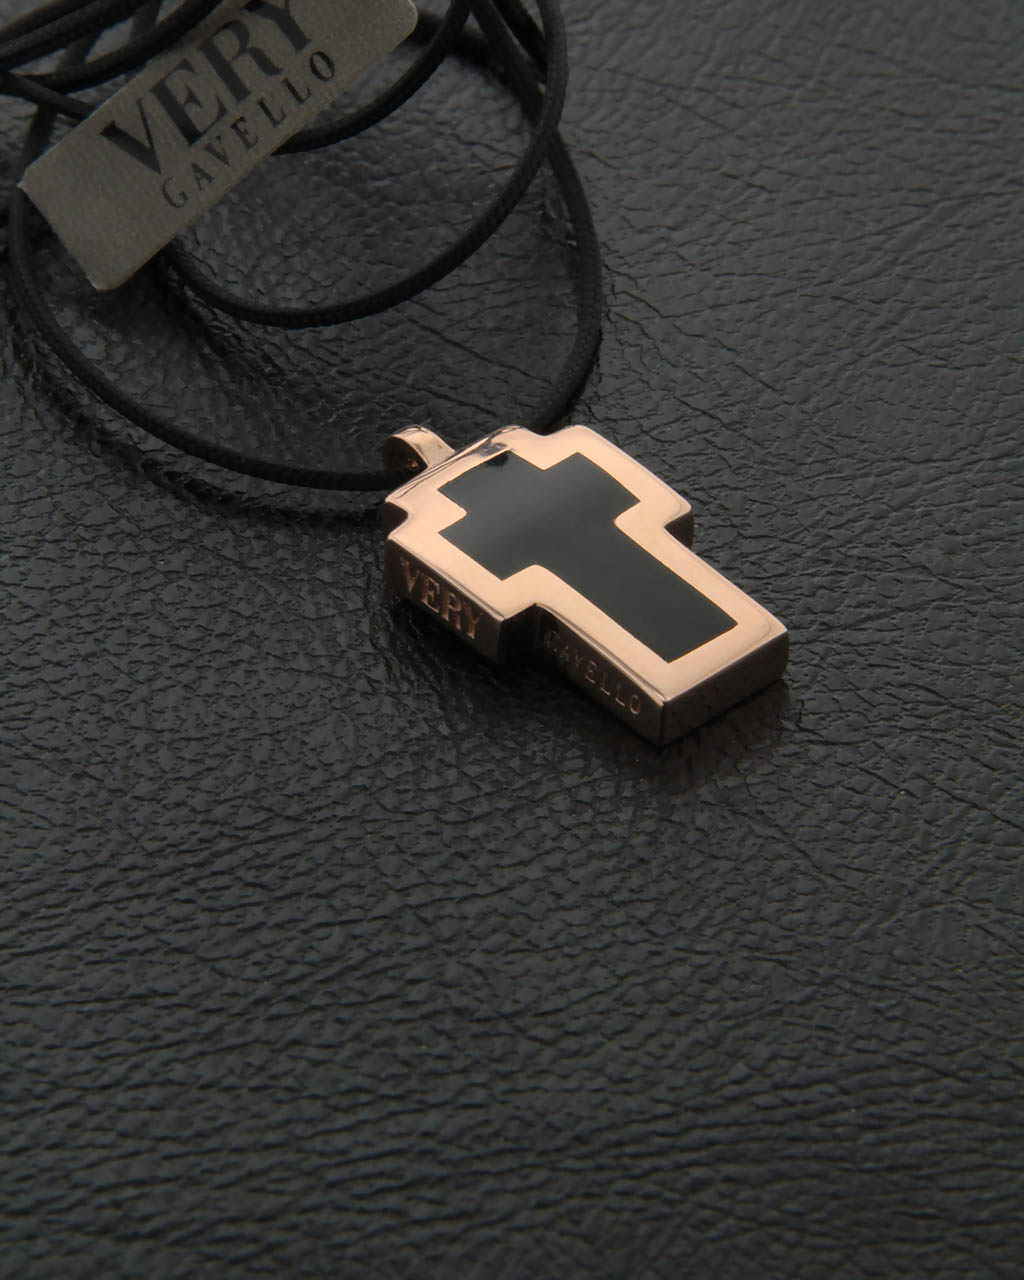 Very Gavello κολιέ σταυρός Tattoo VPTA-L-R1   κοσμηματα σταυροί σταυροί ροζ χρυσό